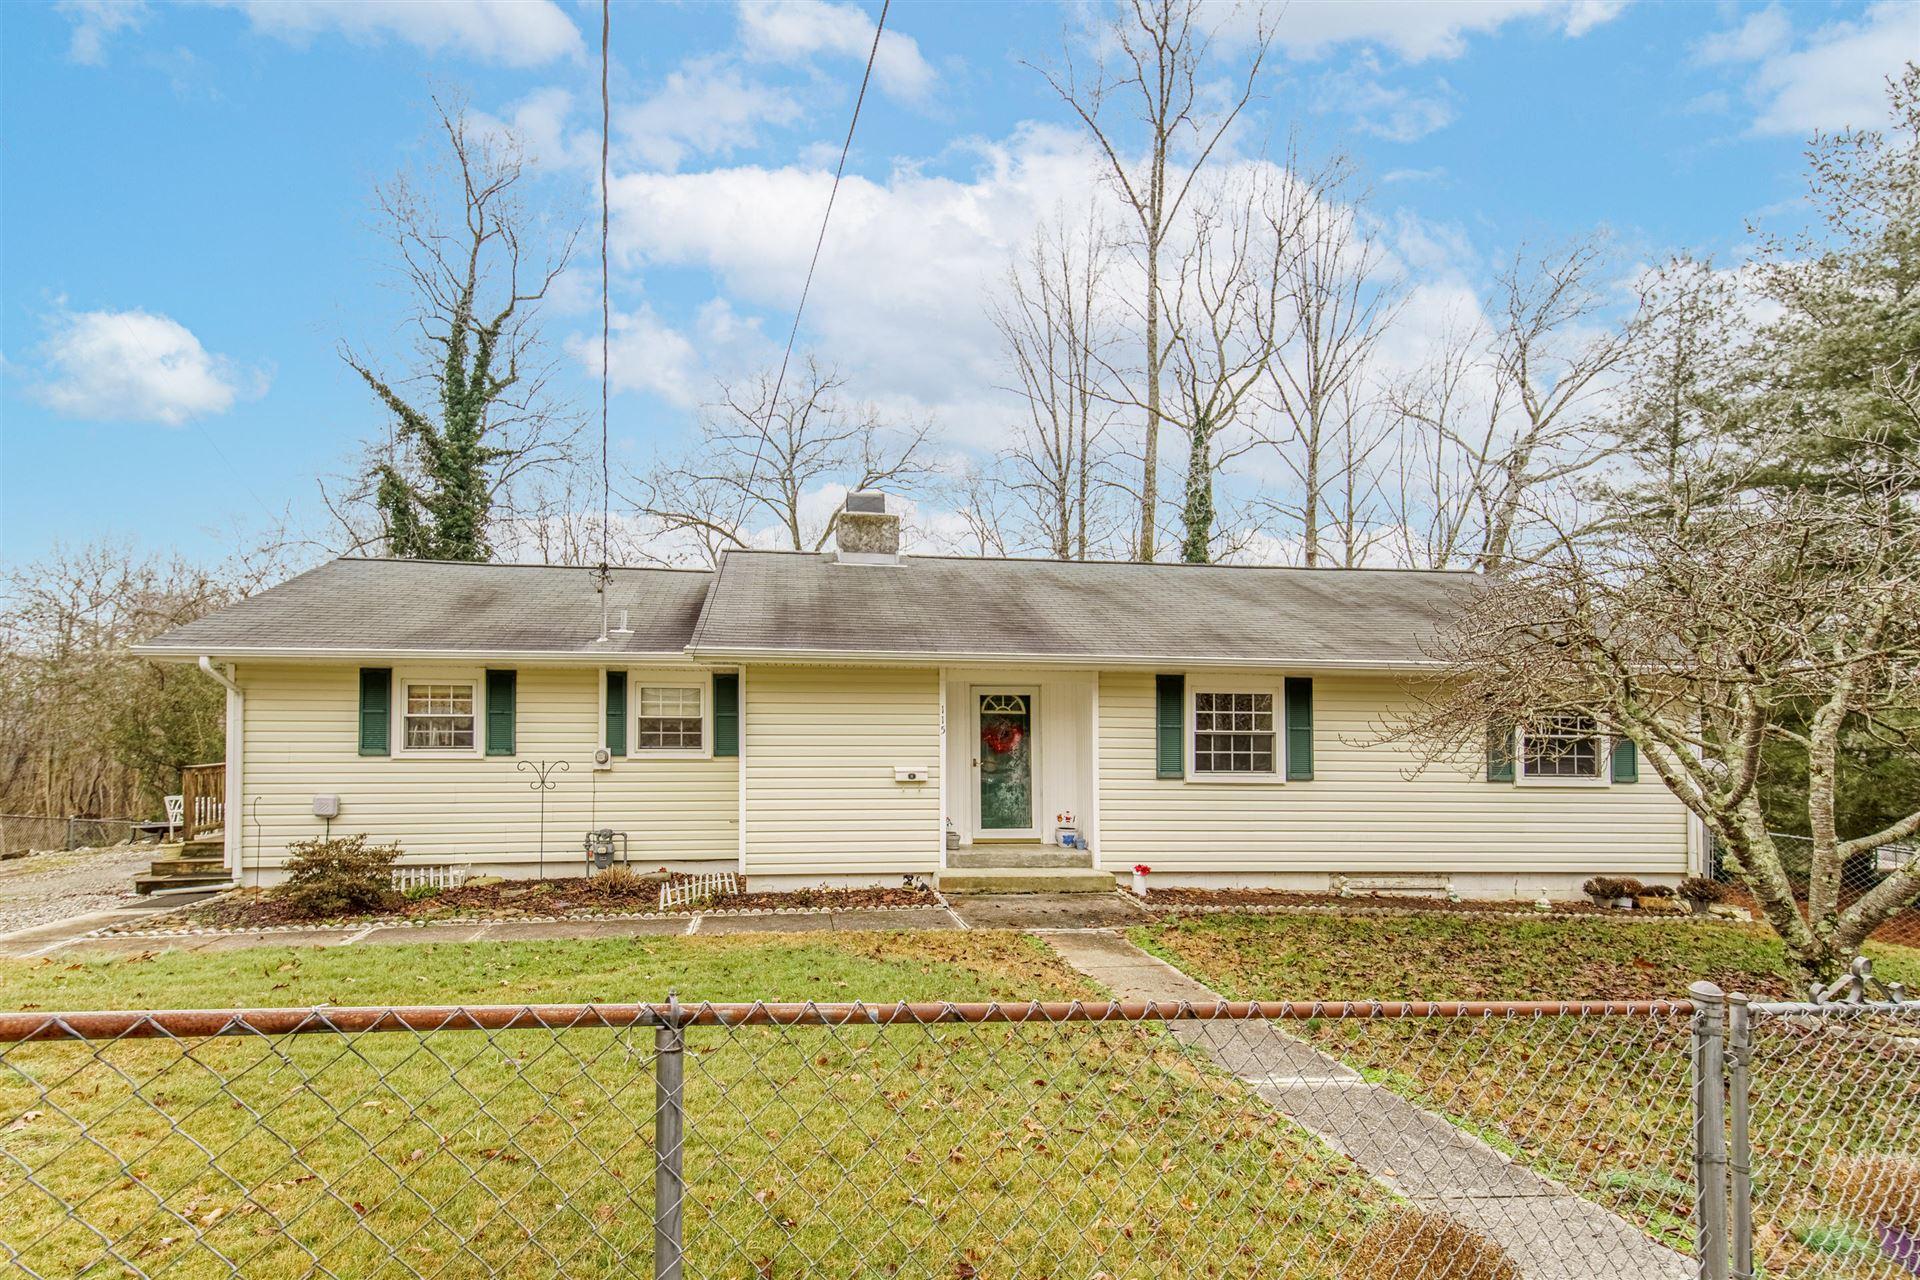 Photo of 115 Pomona Rd, Oak Ridge, TN 37830 (MLS # 1139941)